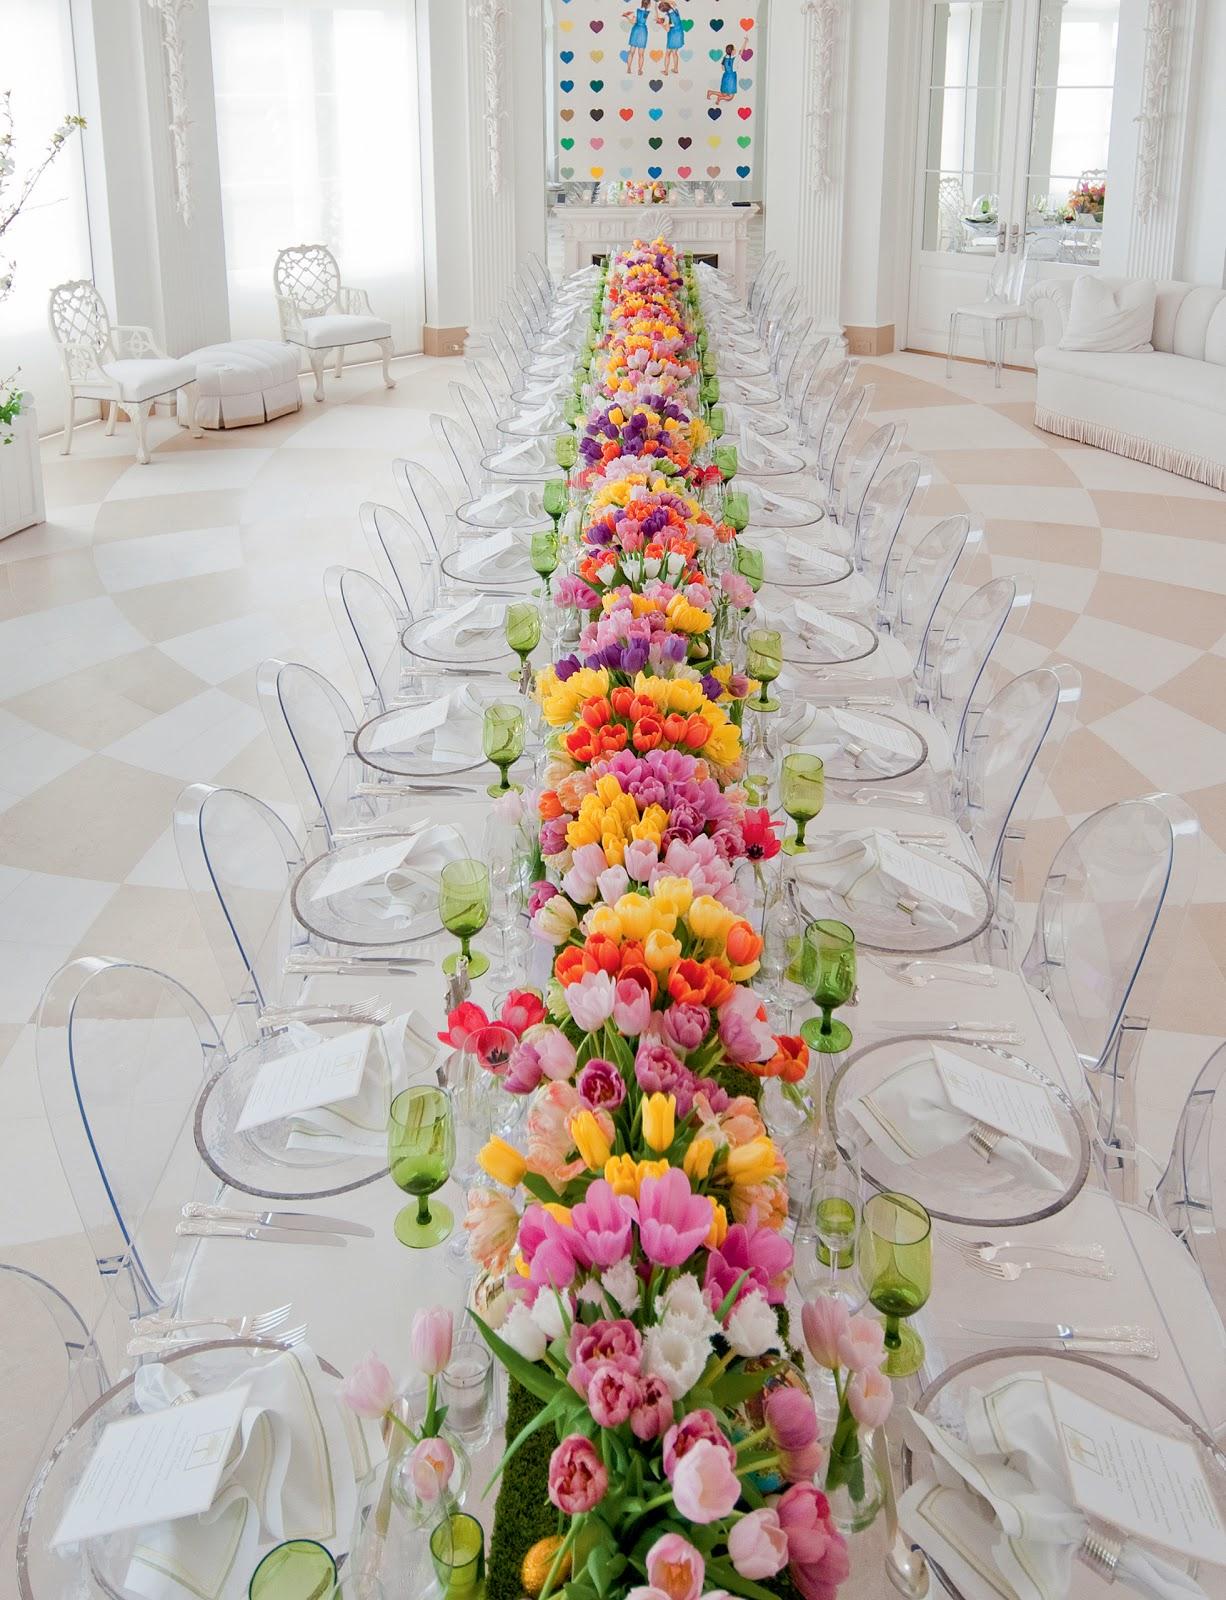 Palm beach entertaining mario buatta and a pagoda pool for Beach house designs florist